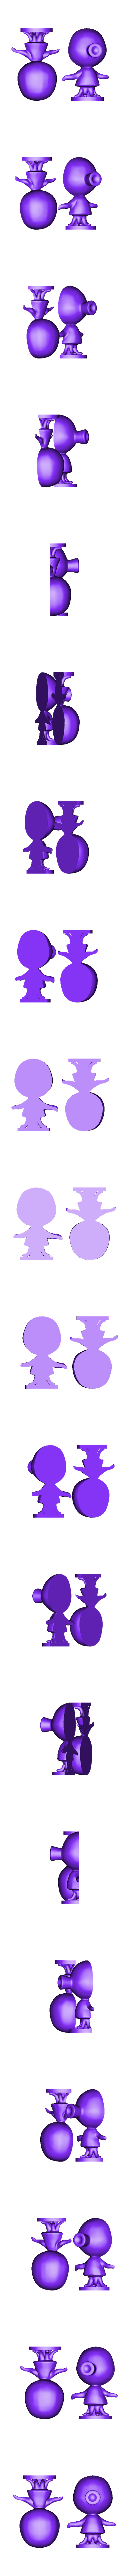 marina v2 split.stl Download free STL file Marina Animal Crossing • 3D printable object, skelei